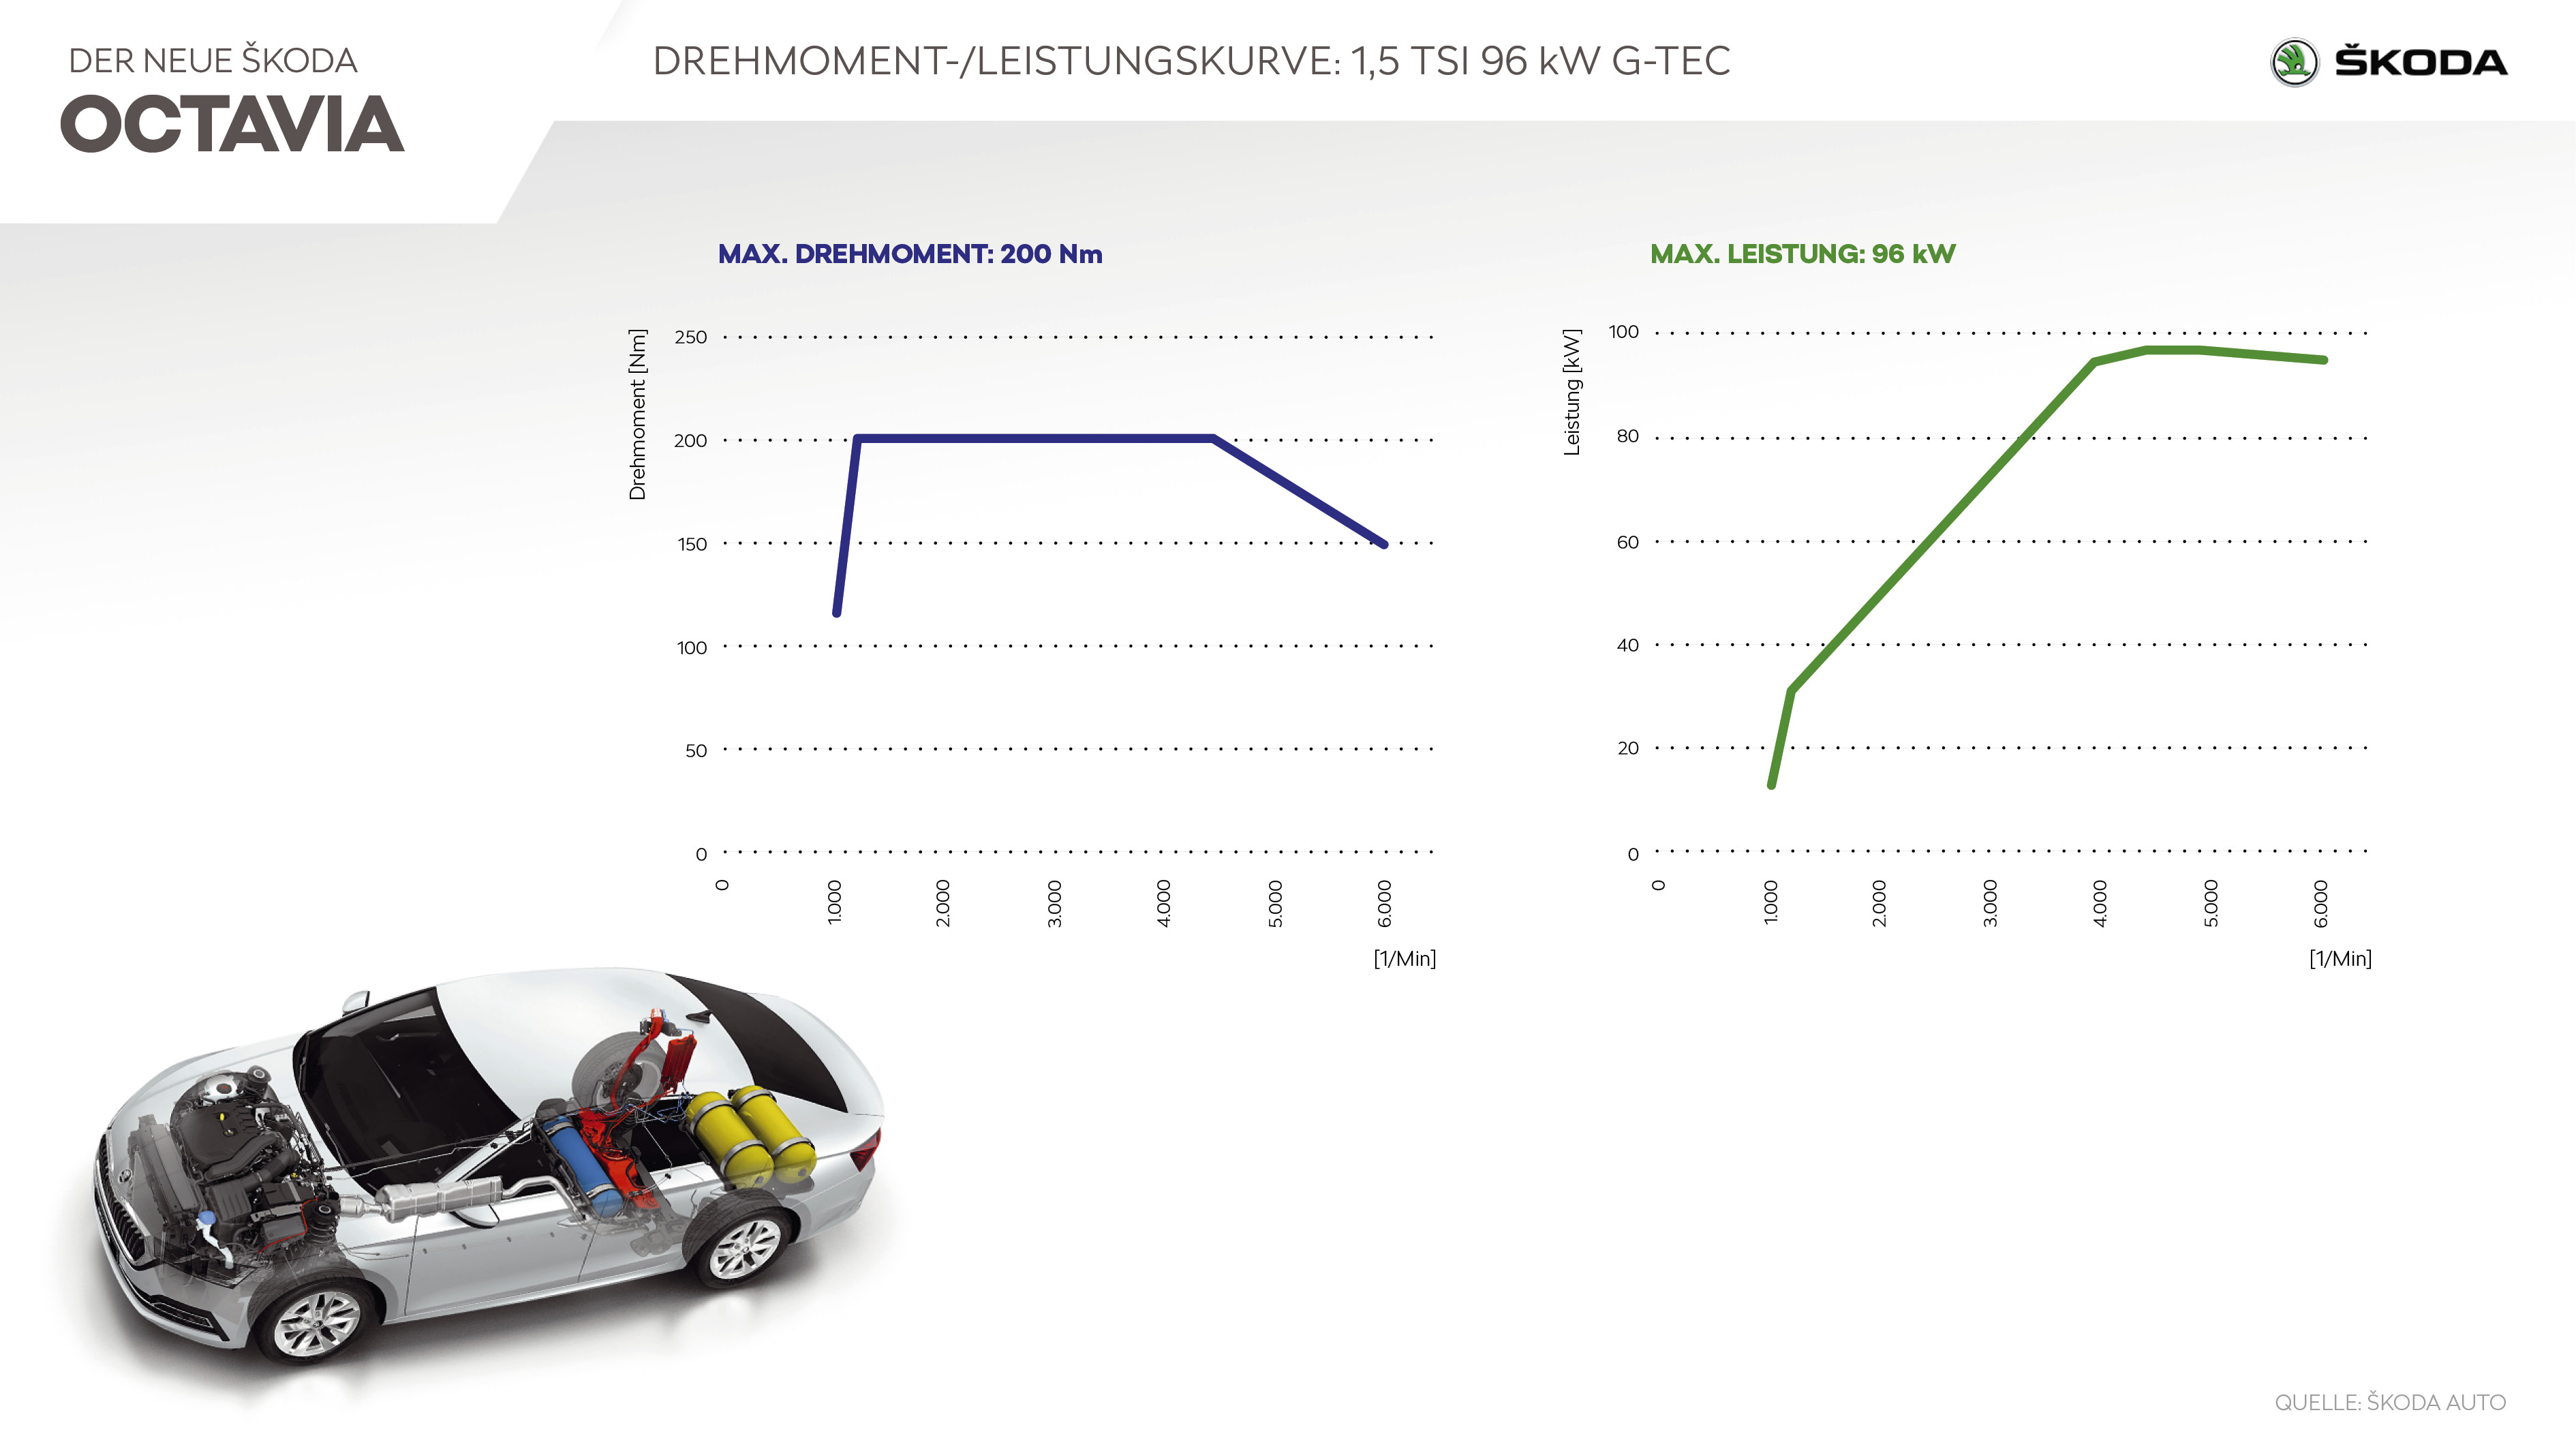 ŠKODA OCTAVIA G-TEC - Infografik